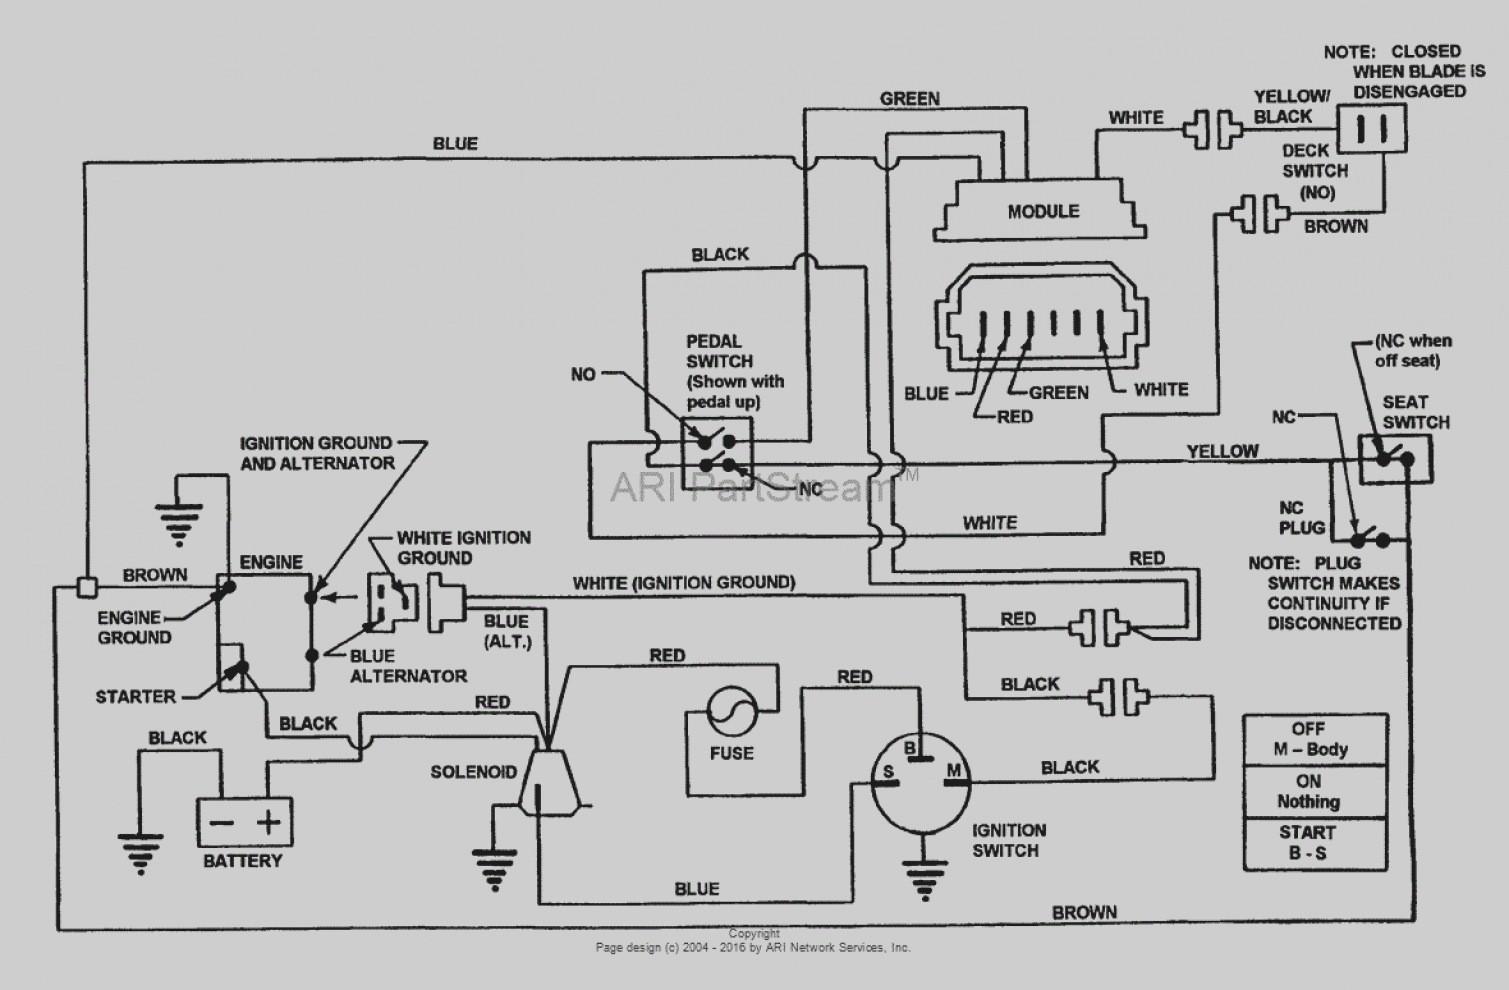 Unique Mercruiser 350 Wiring Diagram Collection - Electrical Circuit ...